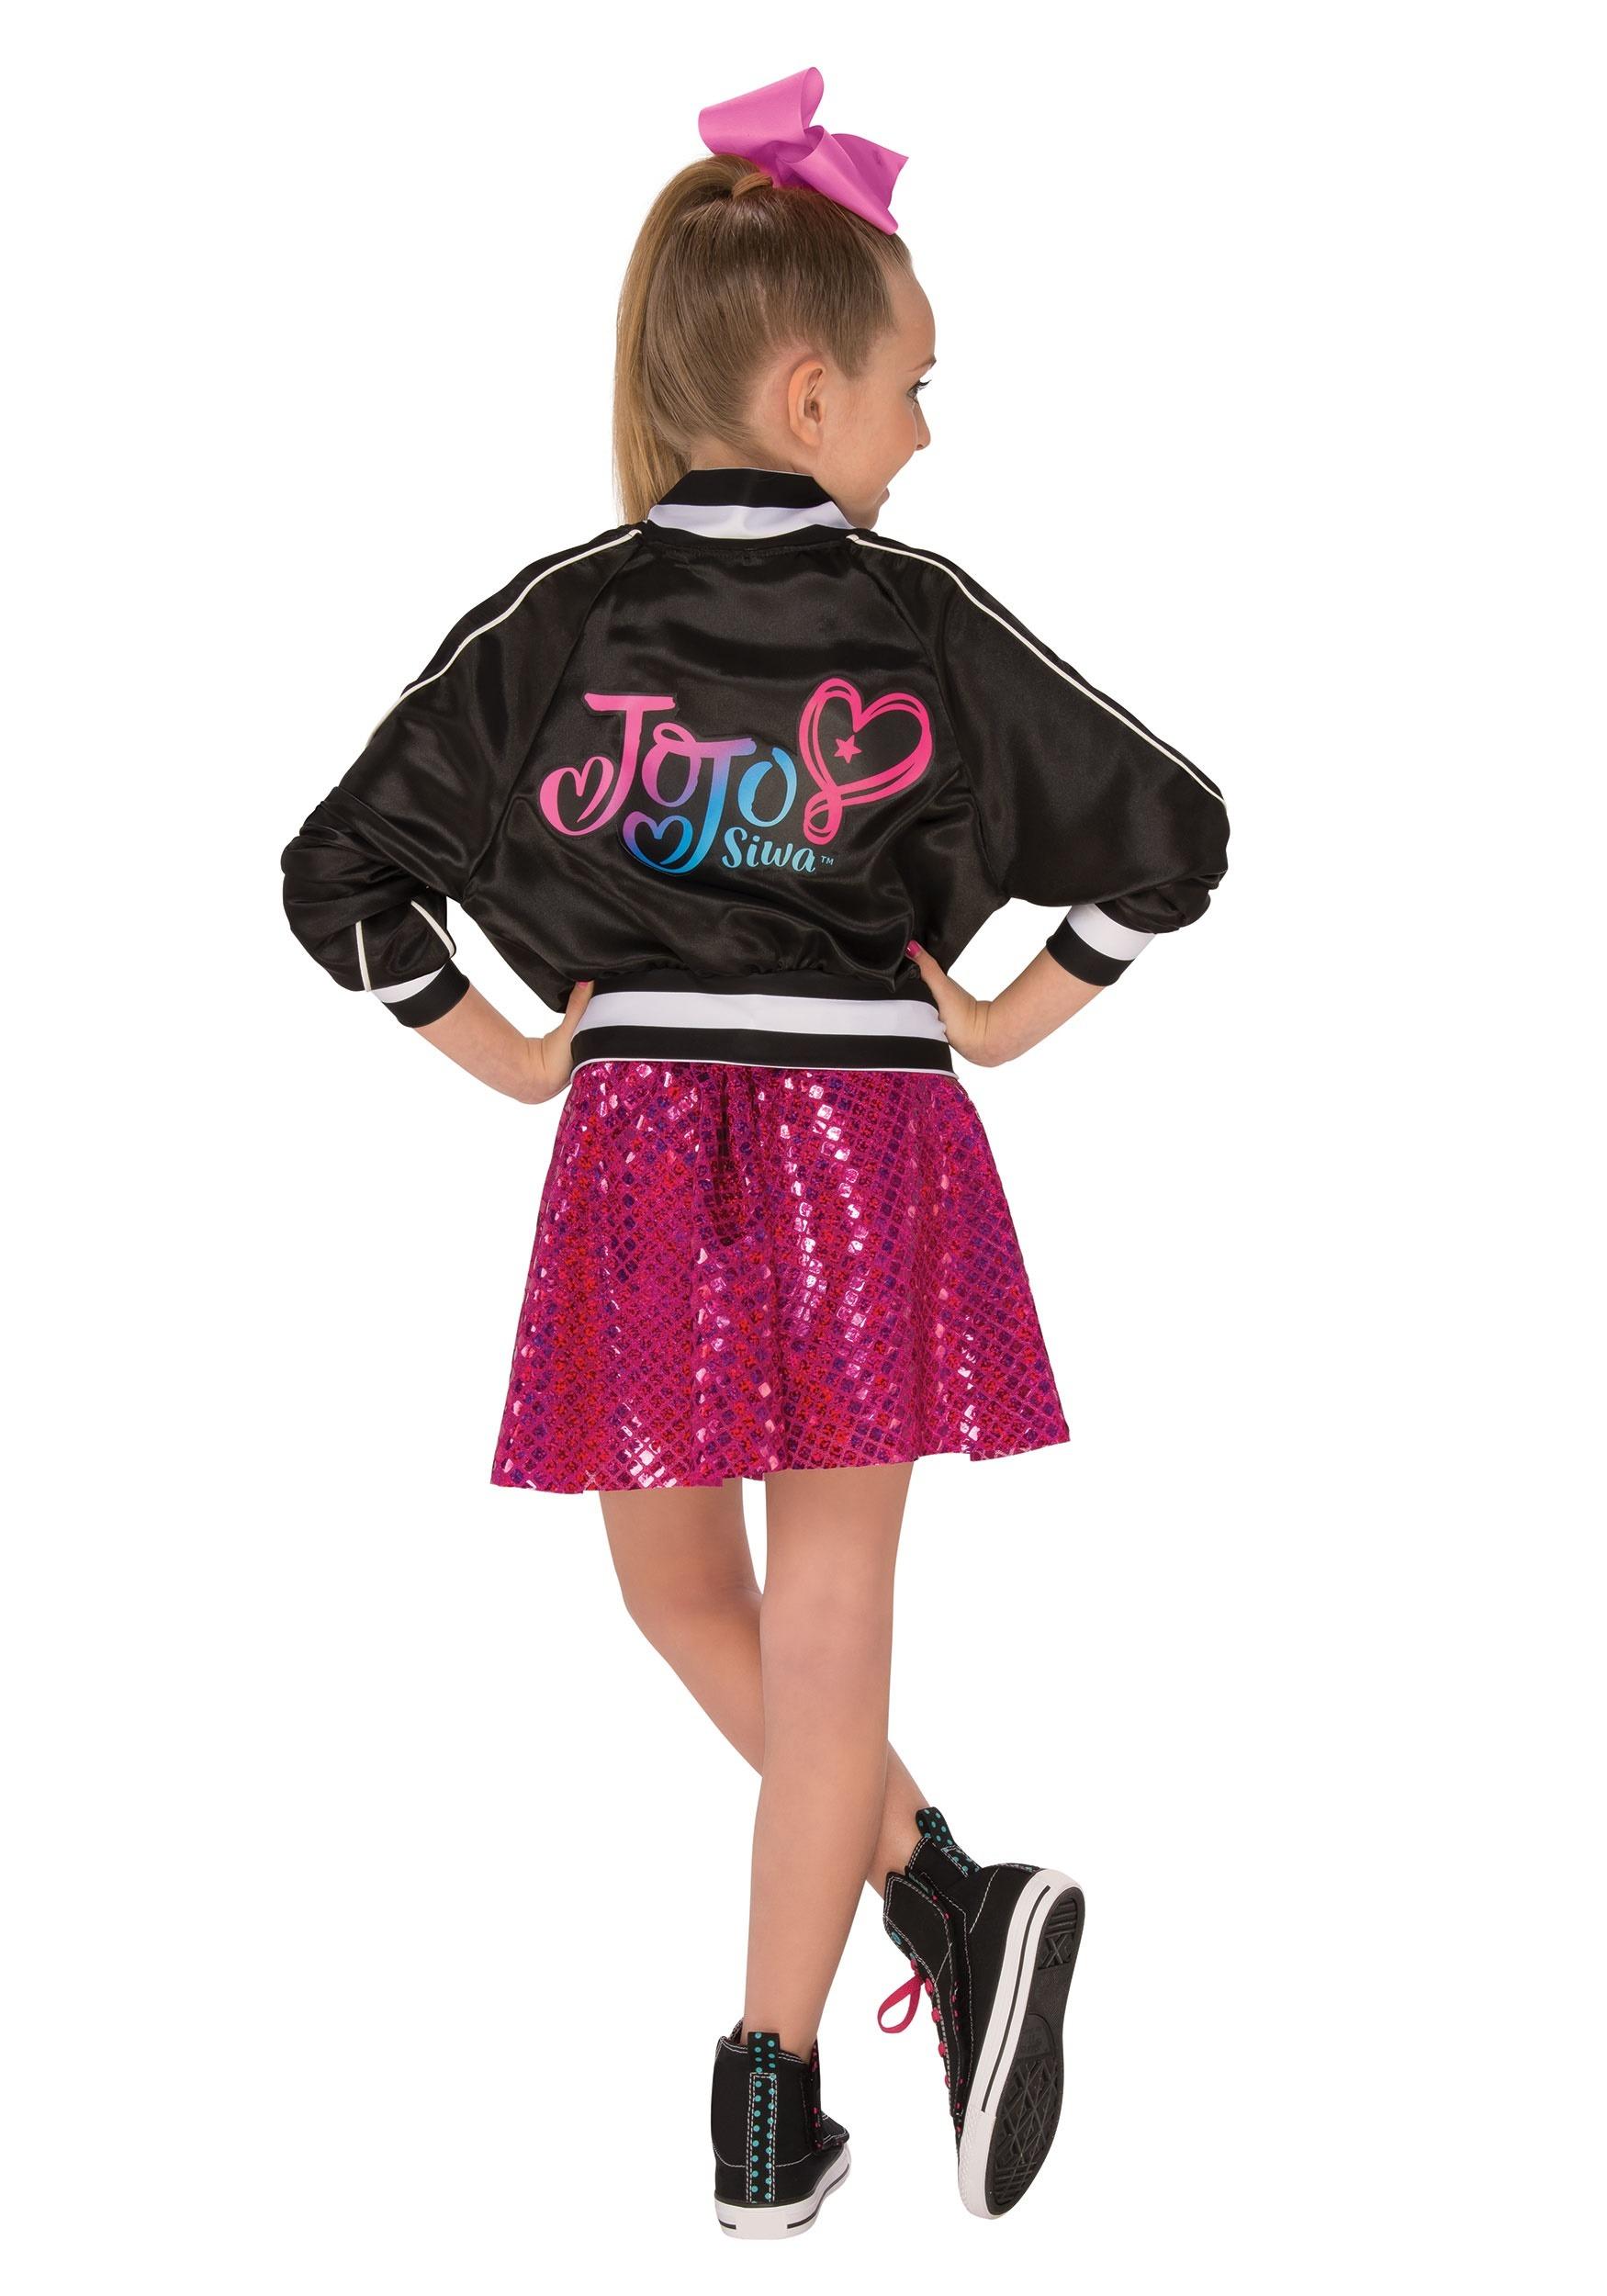 Toddler Kids Girls Jojo Siwa Halloween Costume Cropped Biker Jacket Rainbow